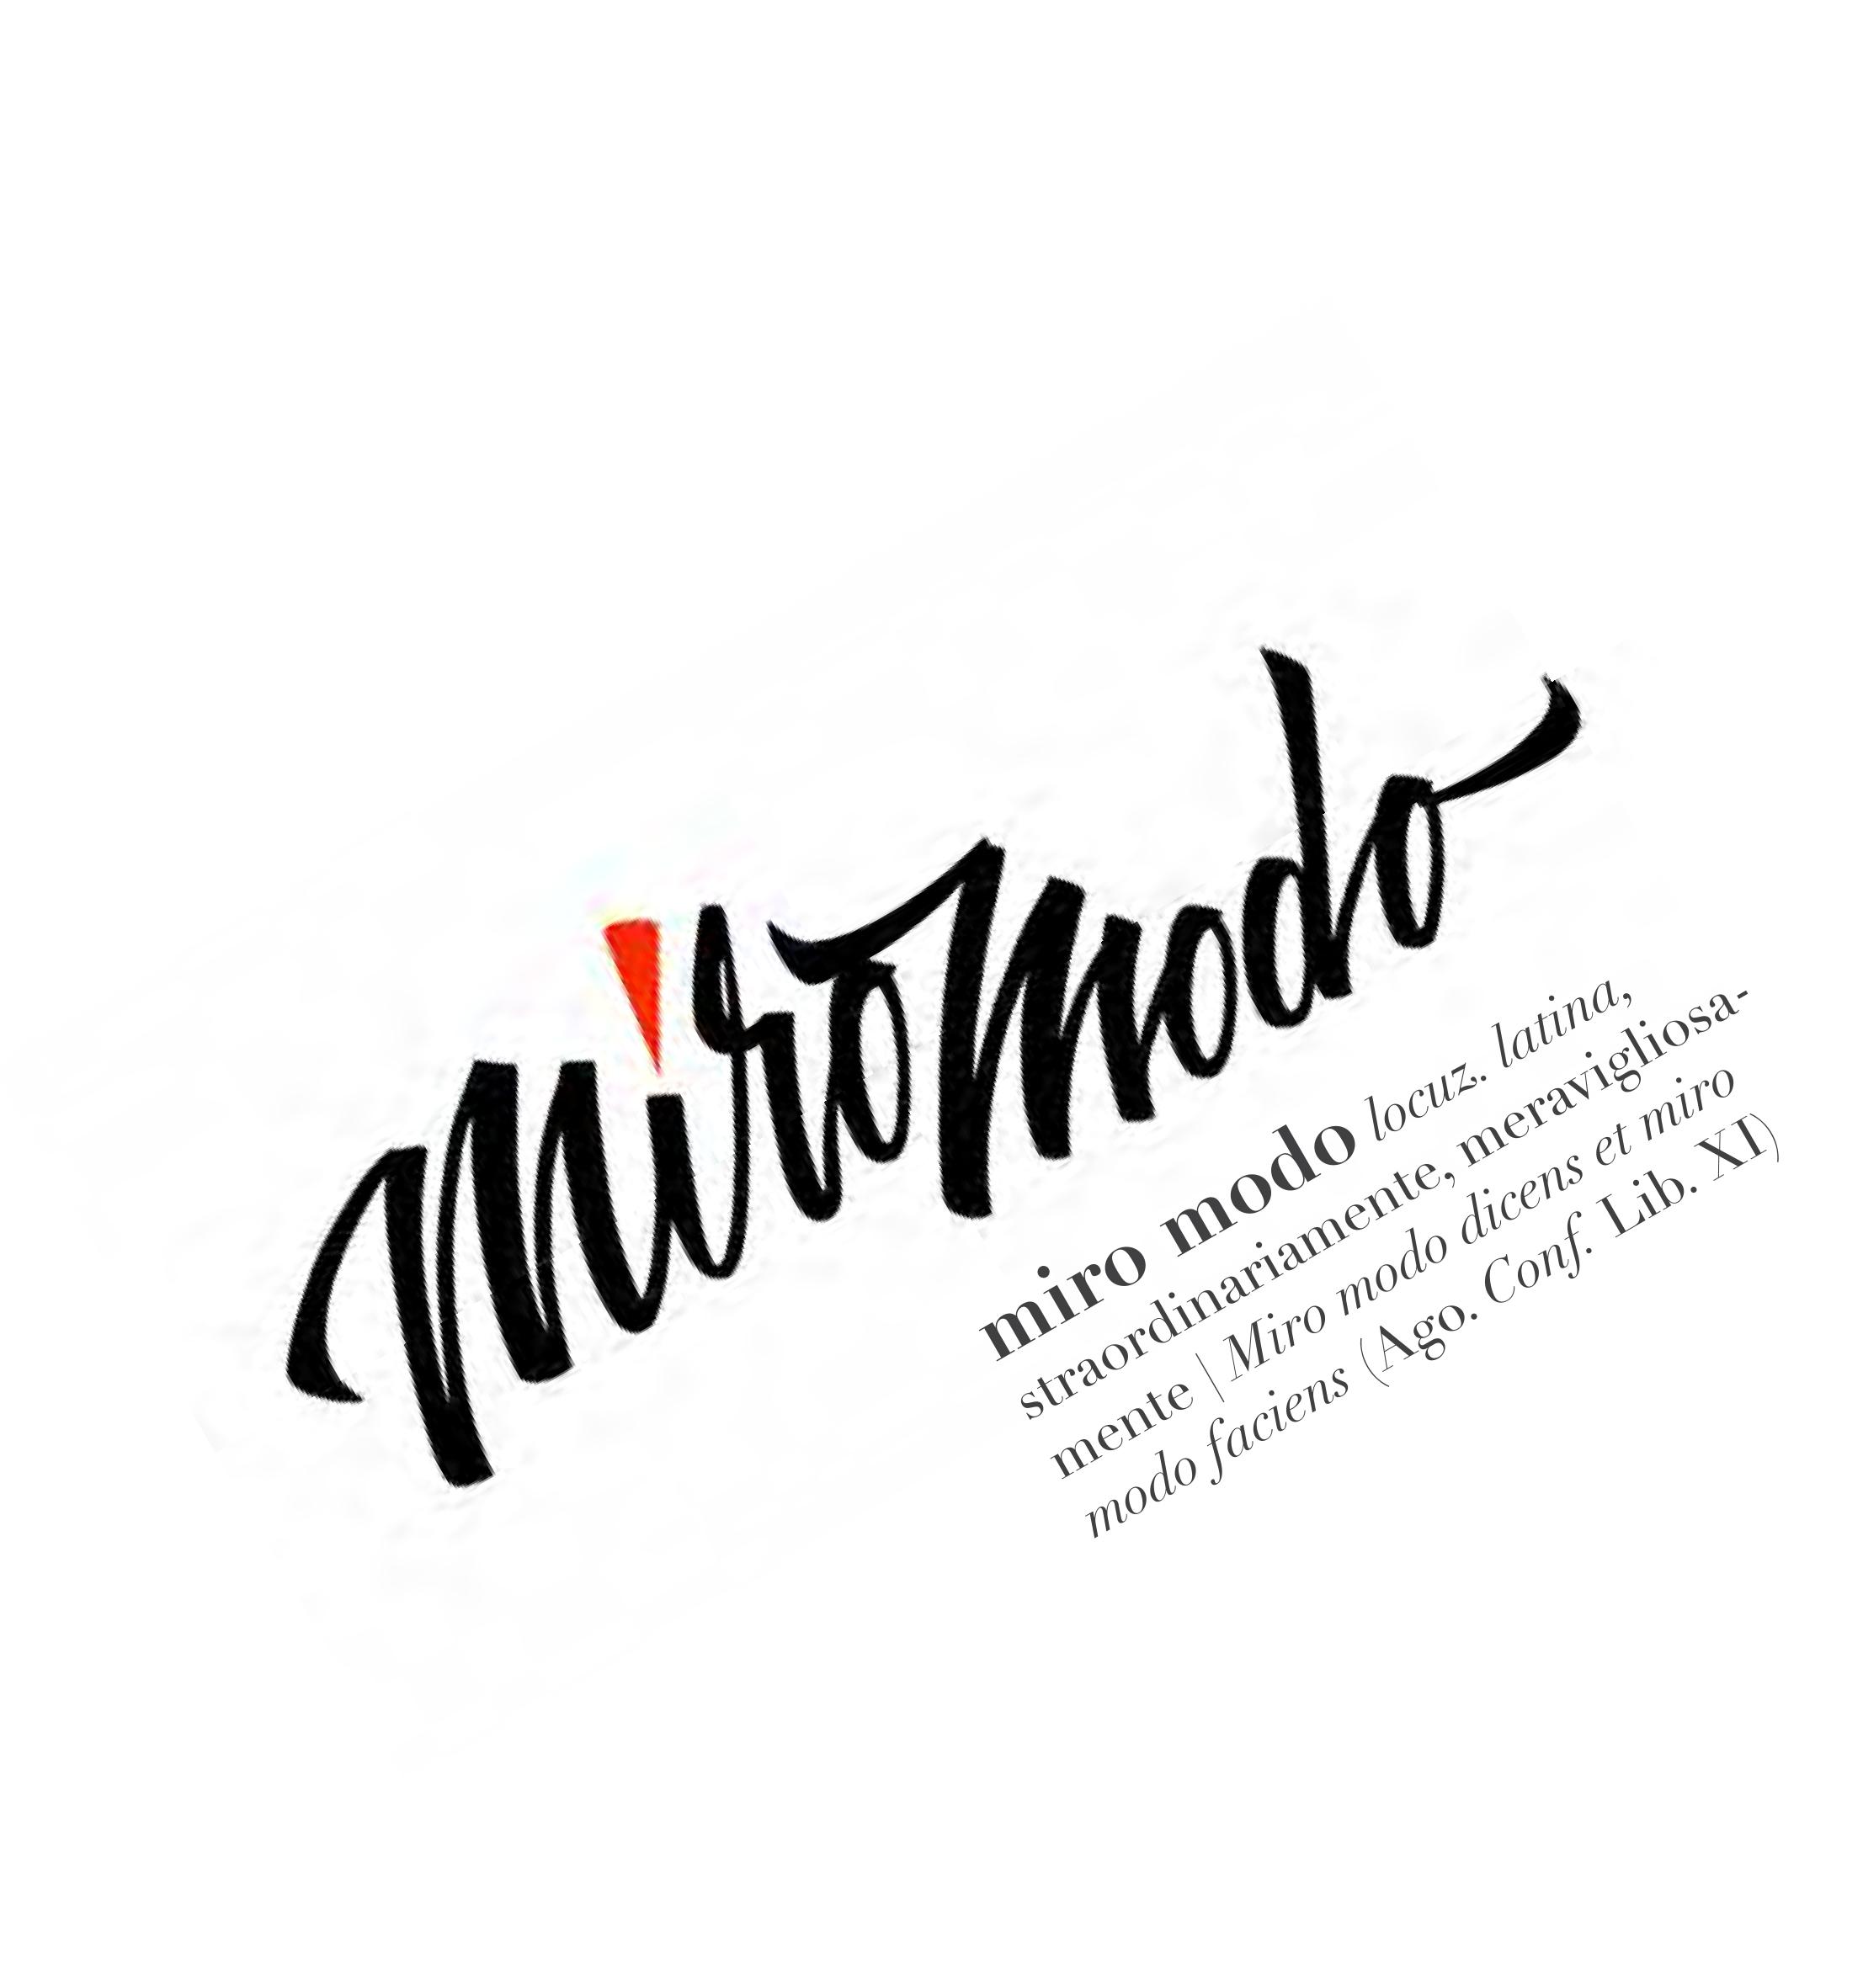 Miromodo_flyer_print